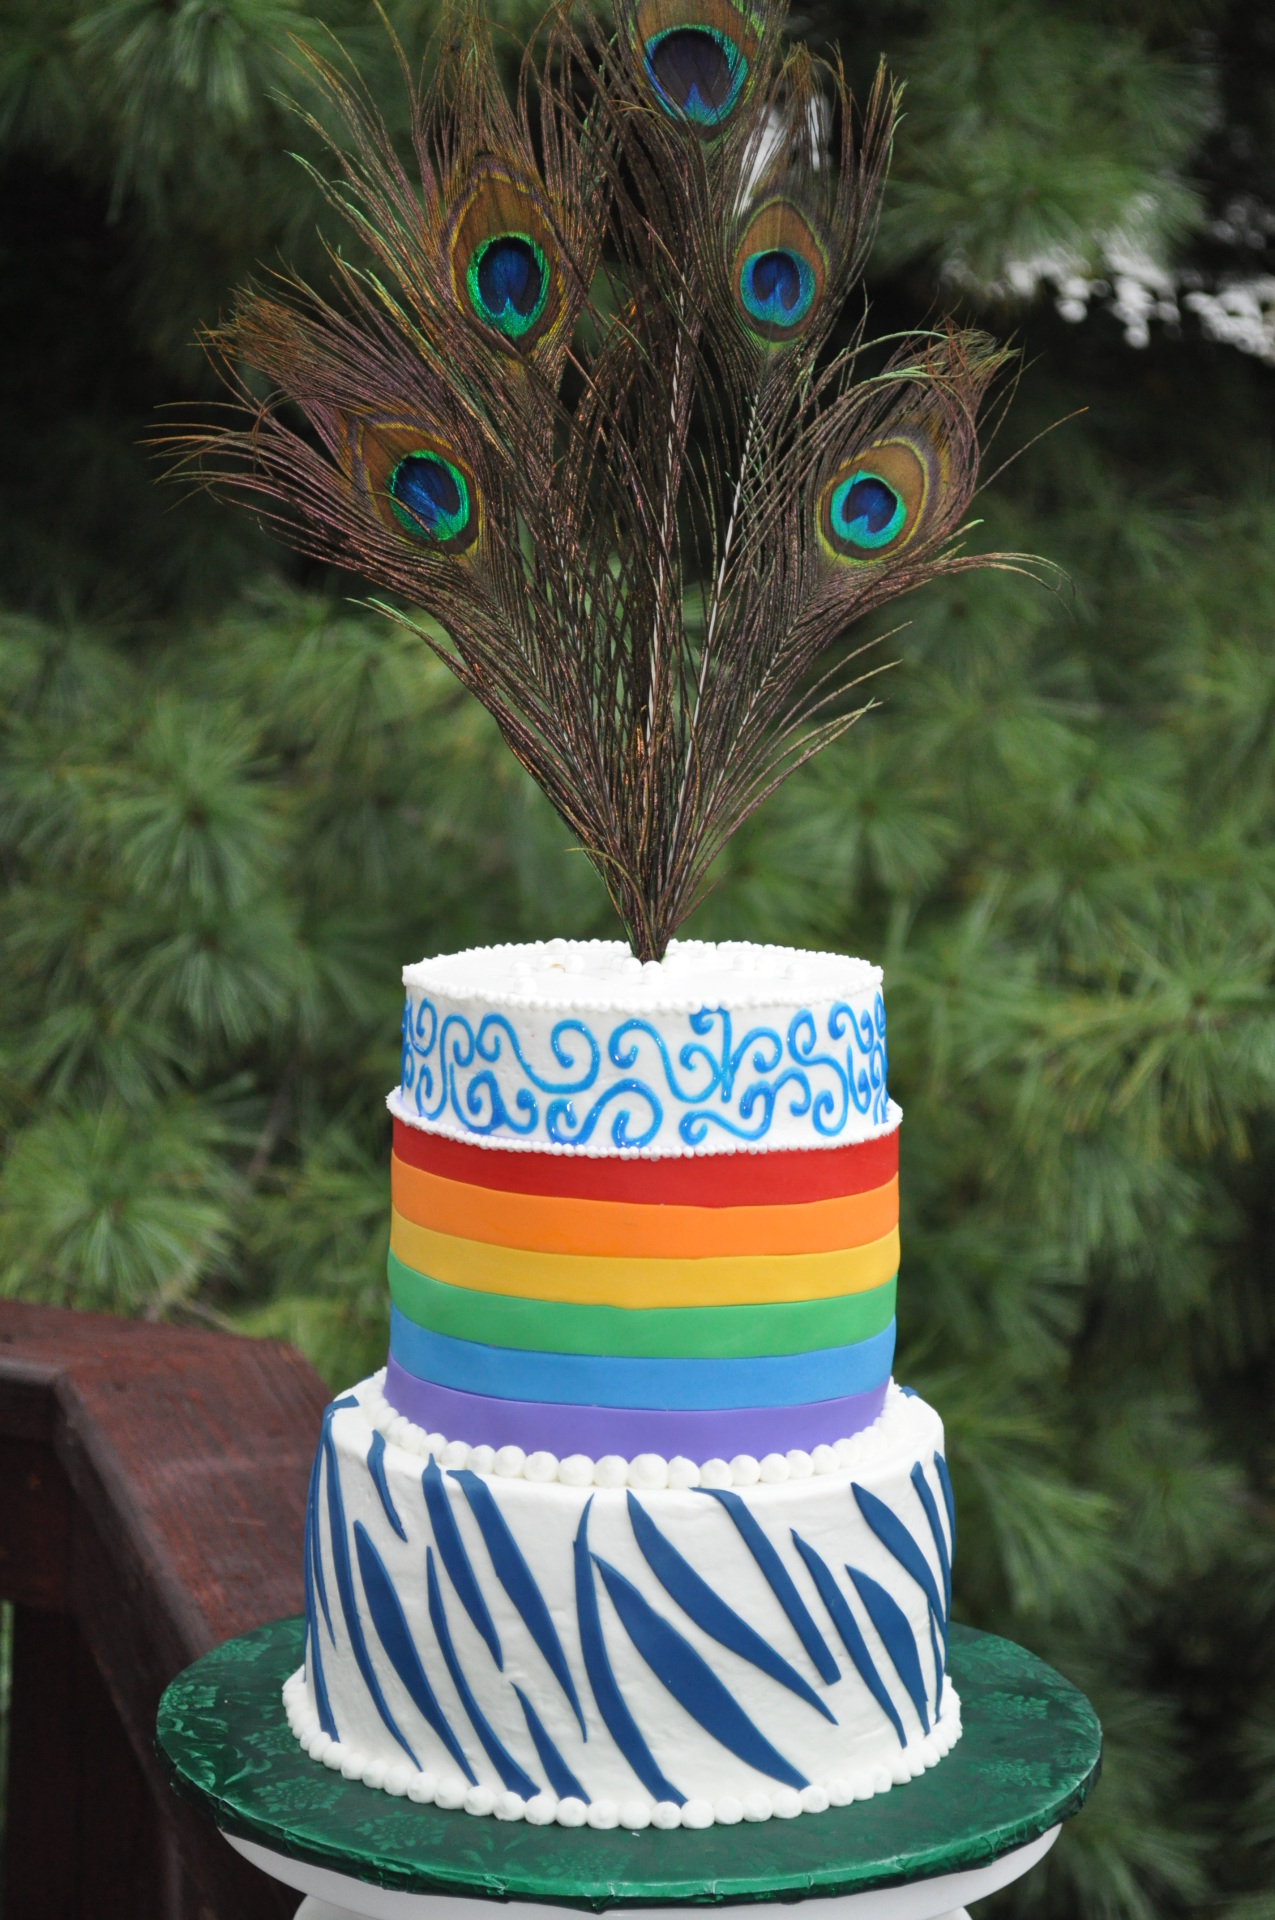 Rainbow cake, peacock feathers cake